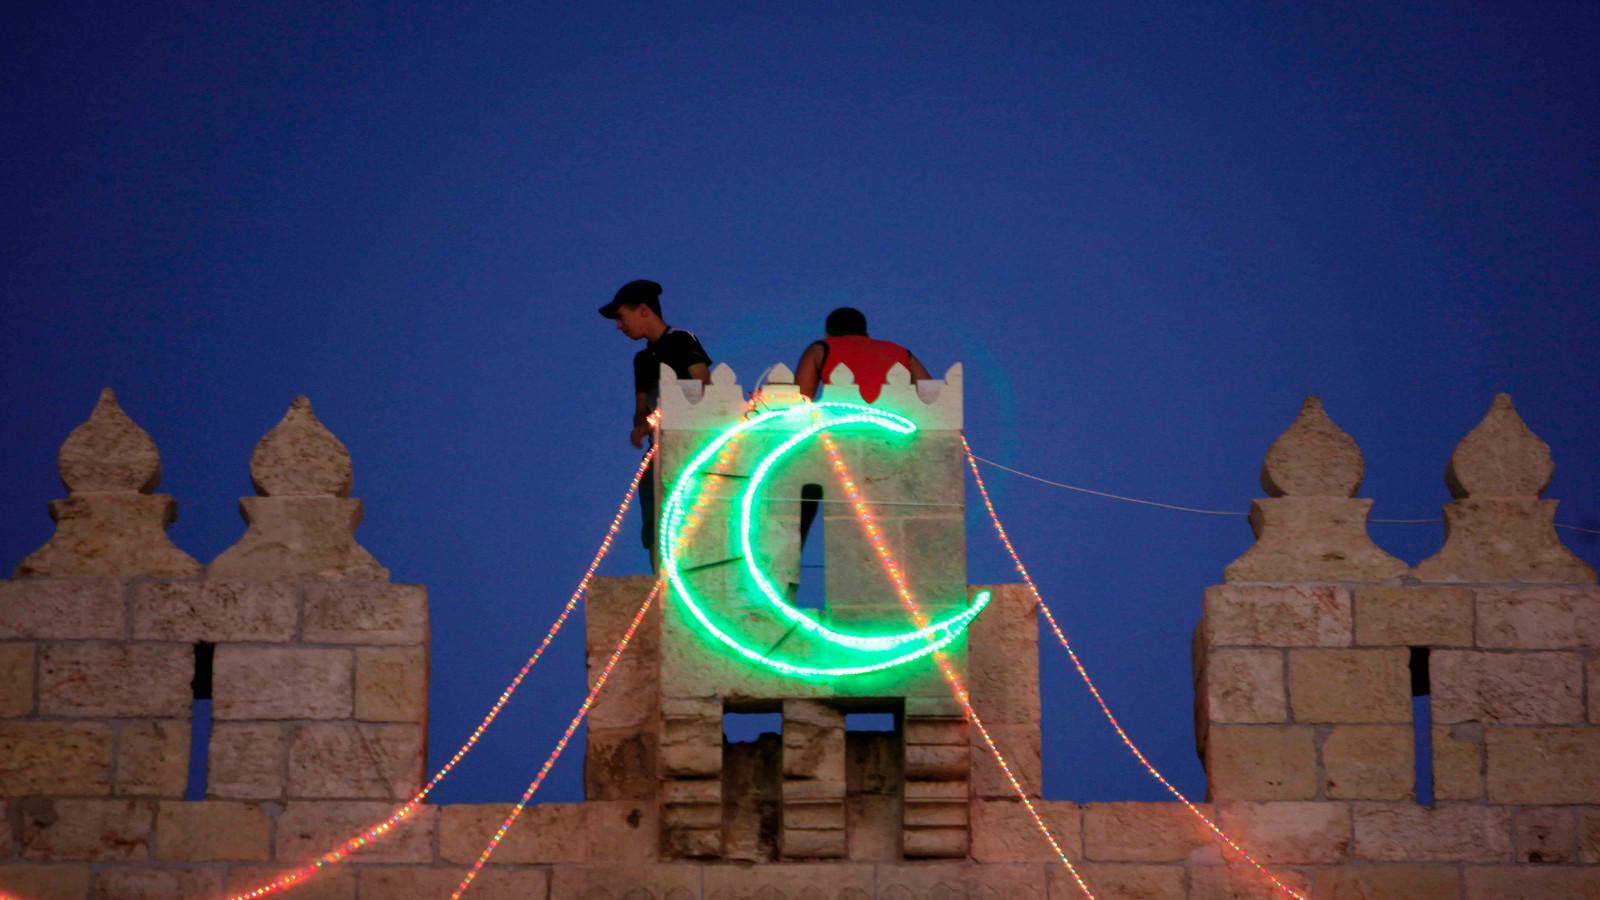 Hanging lights for Ramadan in Jerusalem. Photo by Sliman Khader/FLASH90